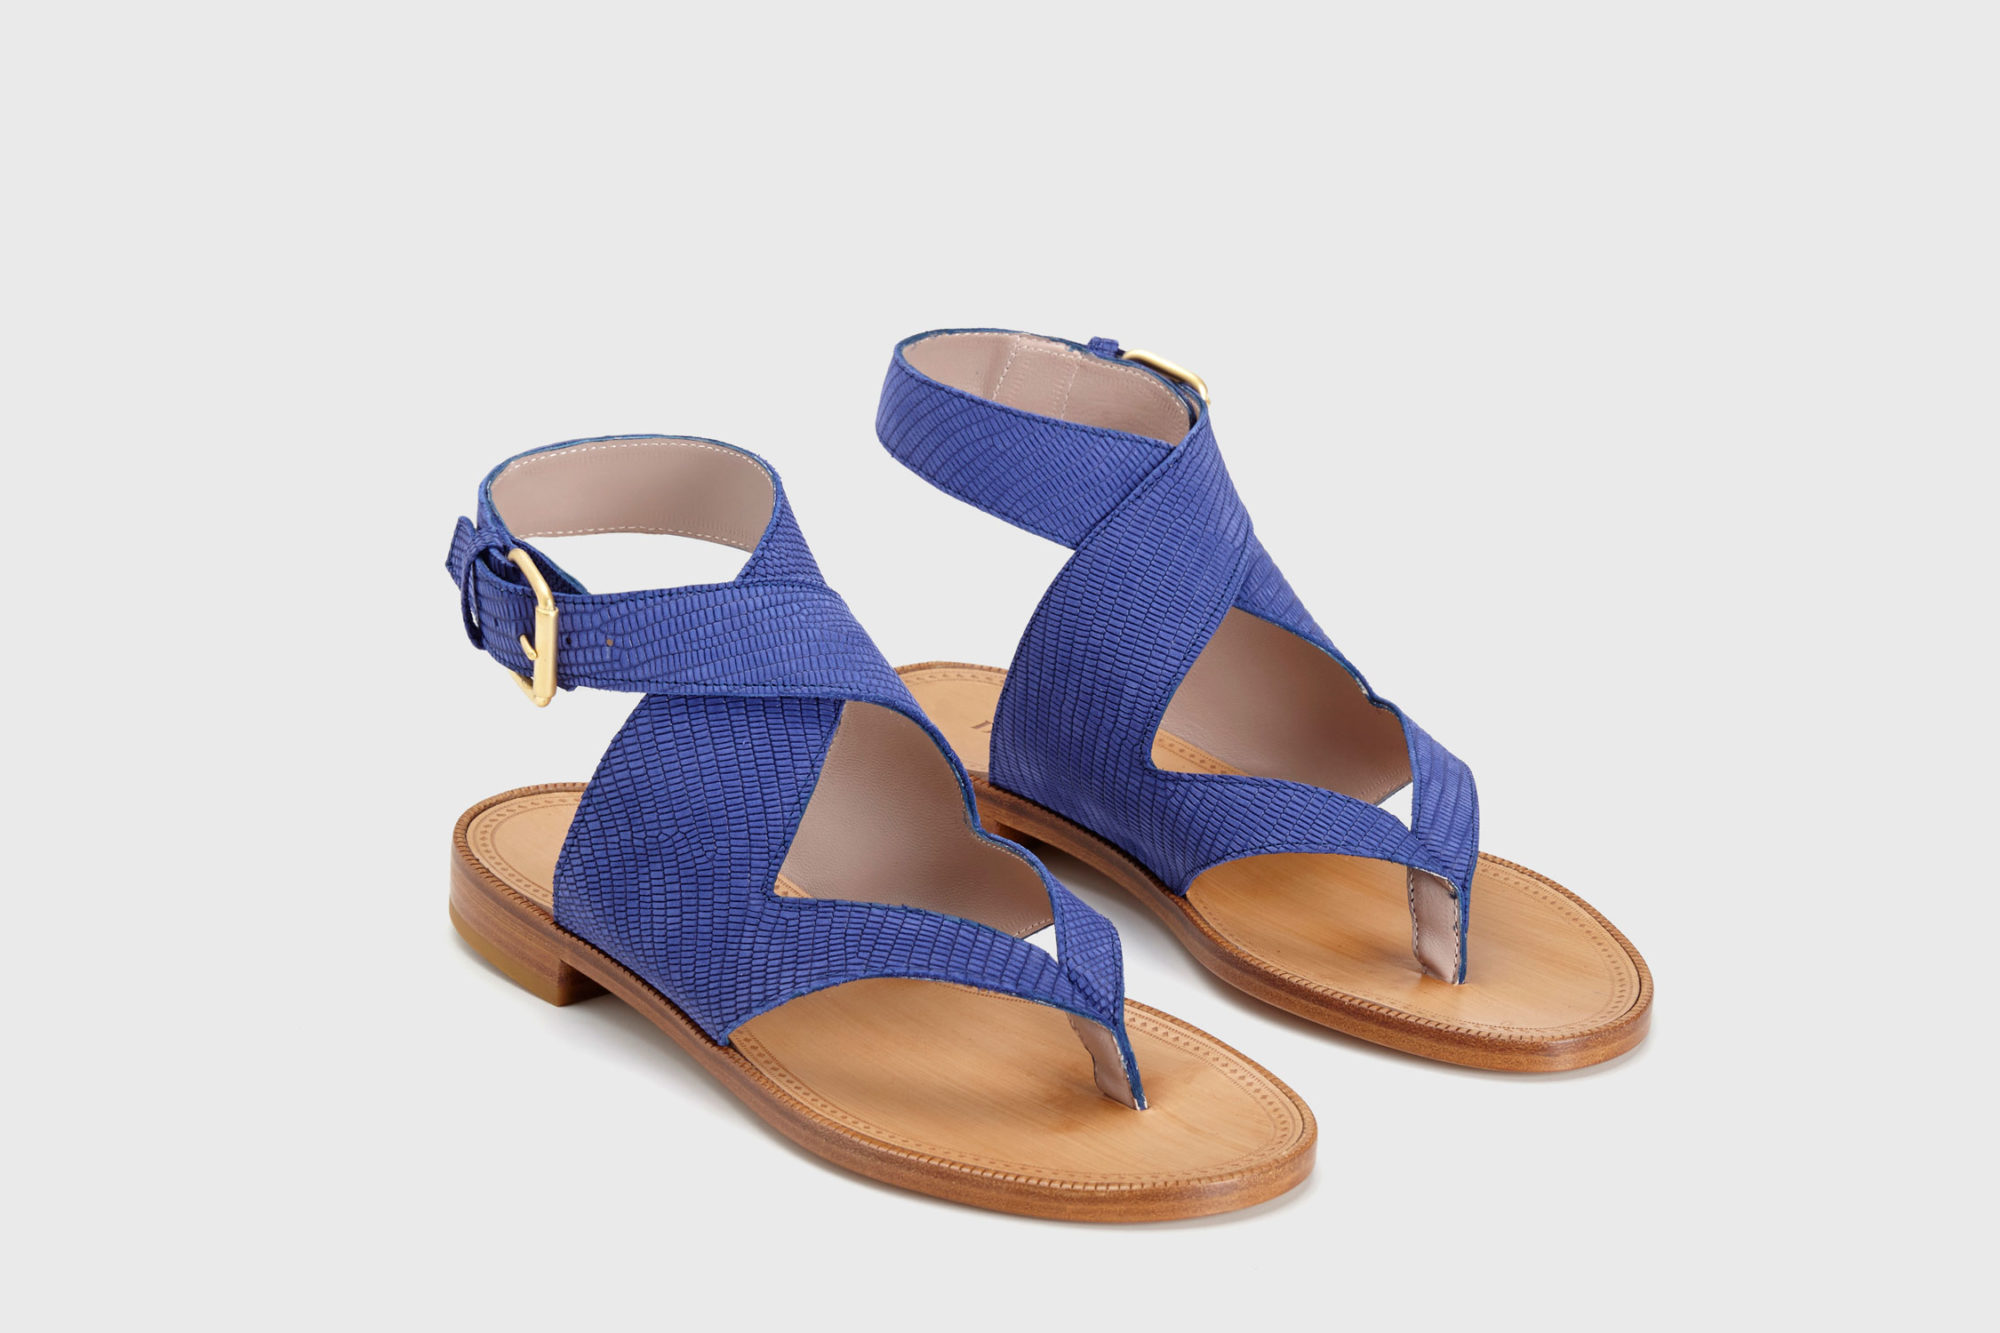 Dorotea sandalia plana Martina azul klein ss17 par